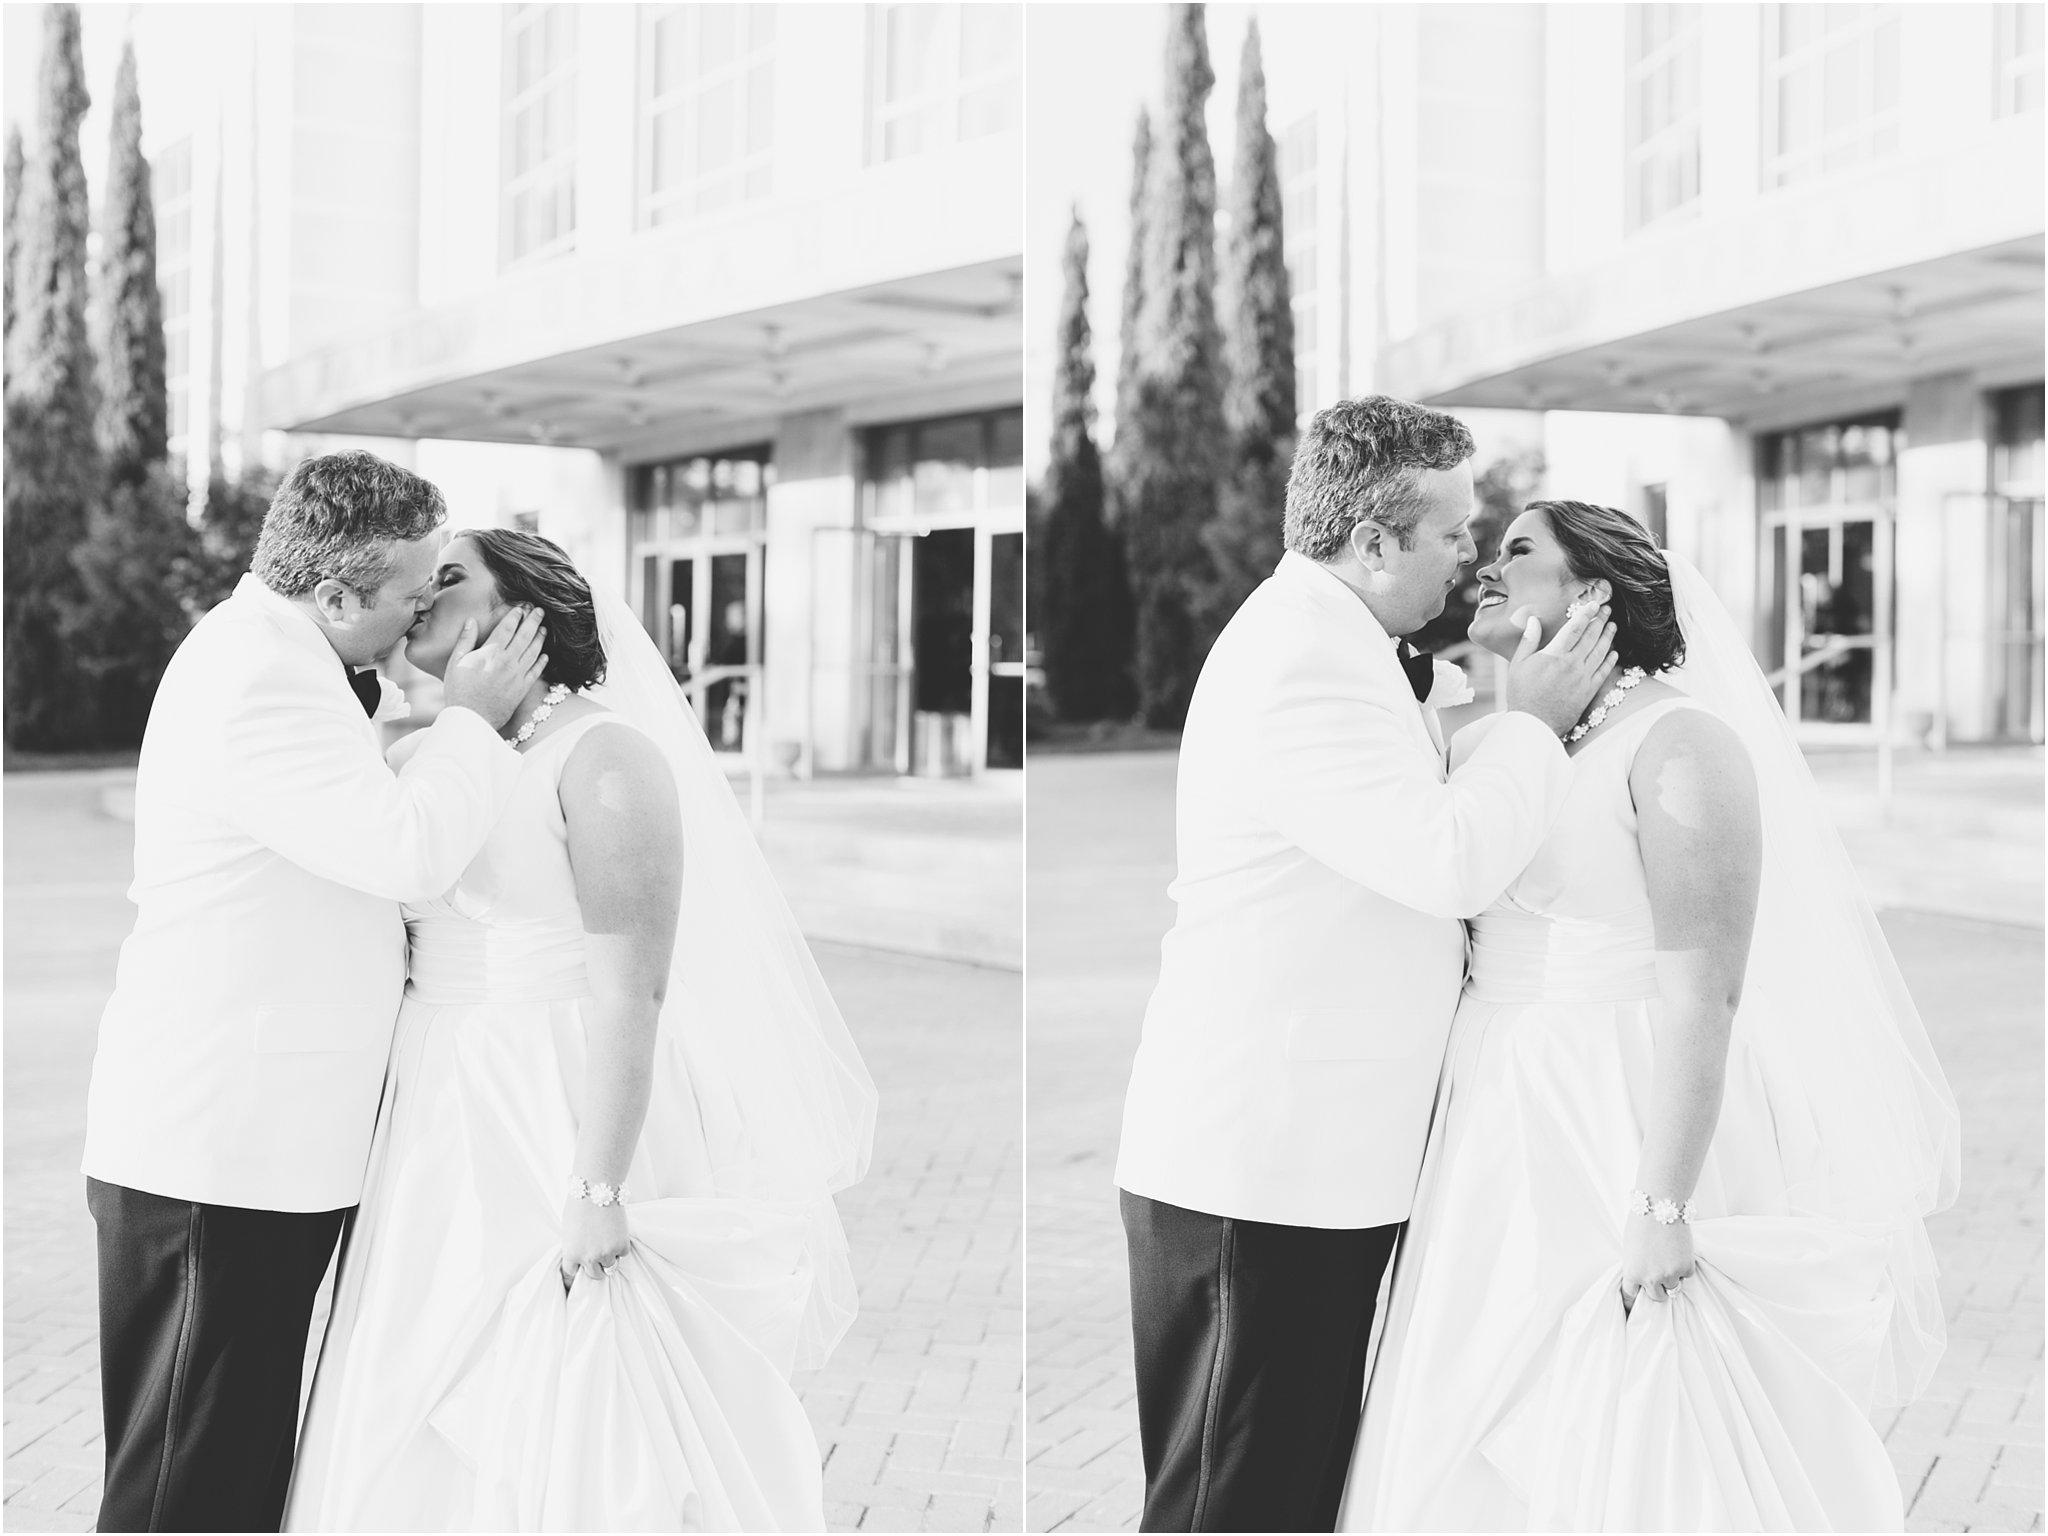 va_jessica_ryan_photography_virginia_wedding_norfolk_harrison_opera_house_norfolk_arts_district_portraits_3810